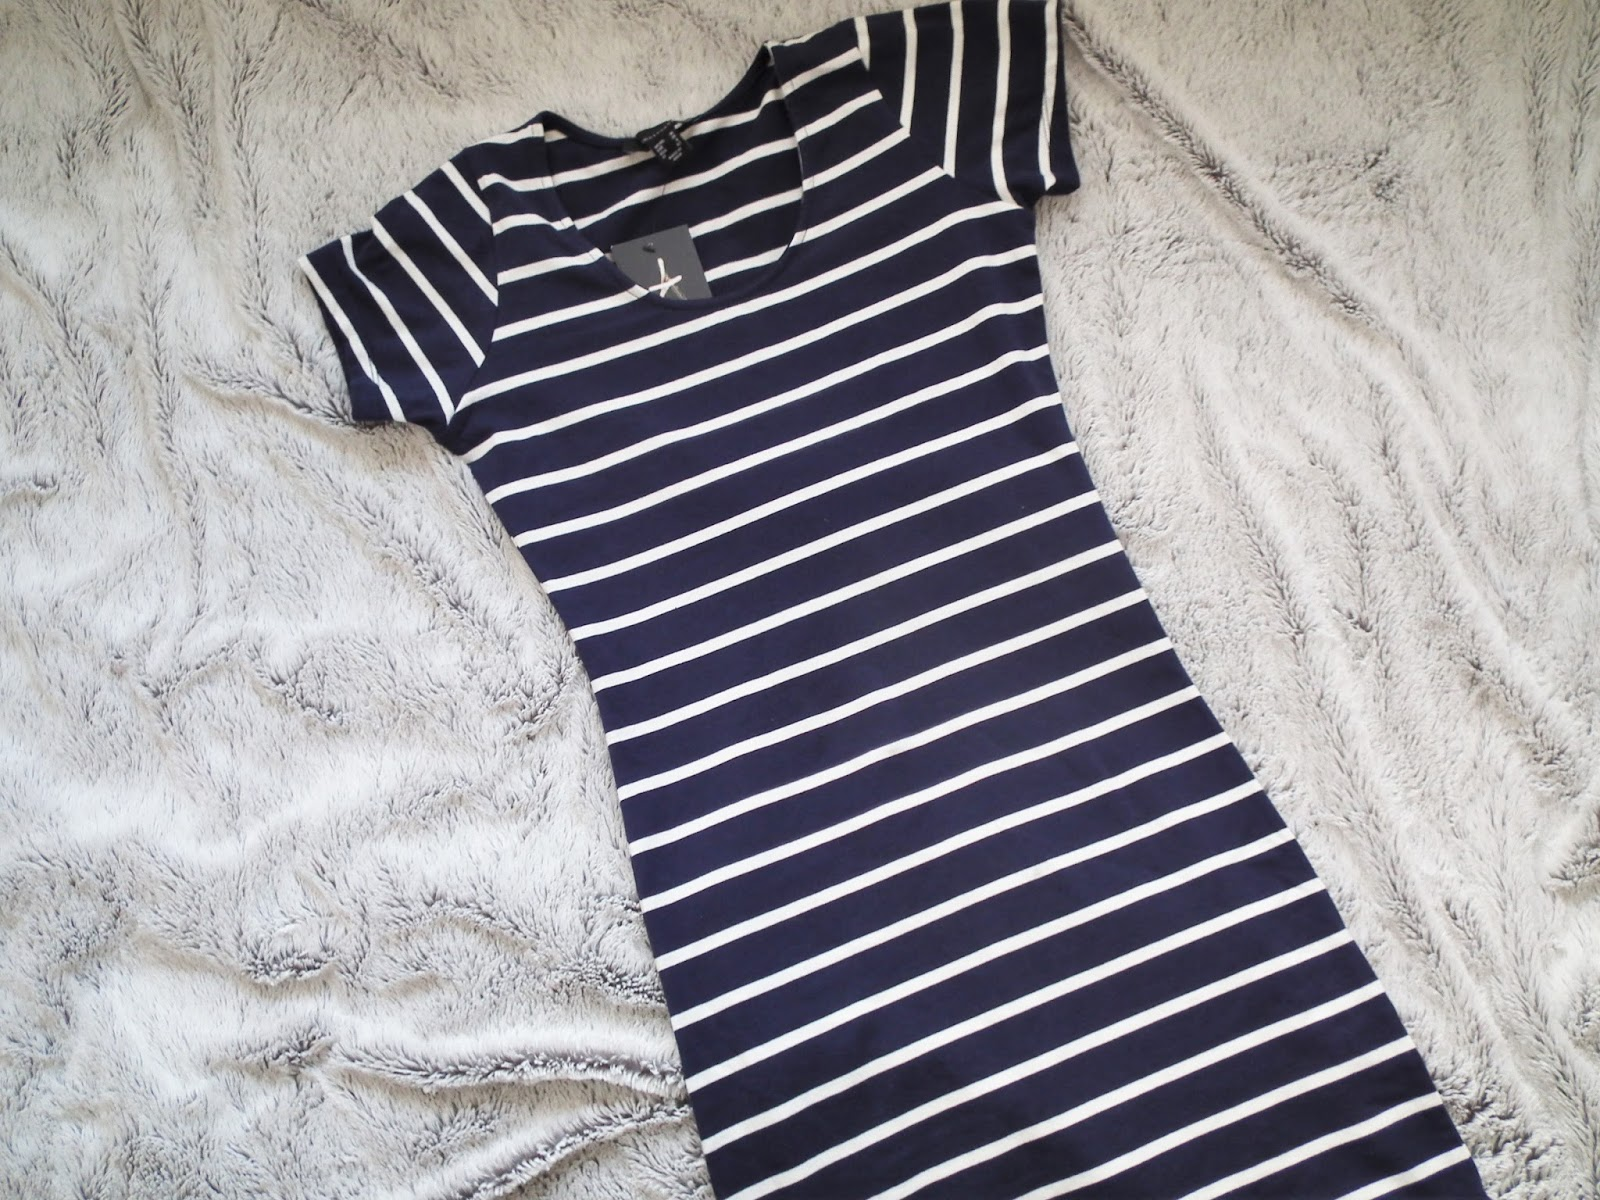 Primark Haul - Spring 2016 Blue and white striped bodycon dress